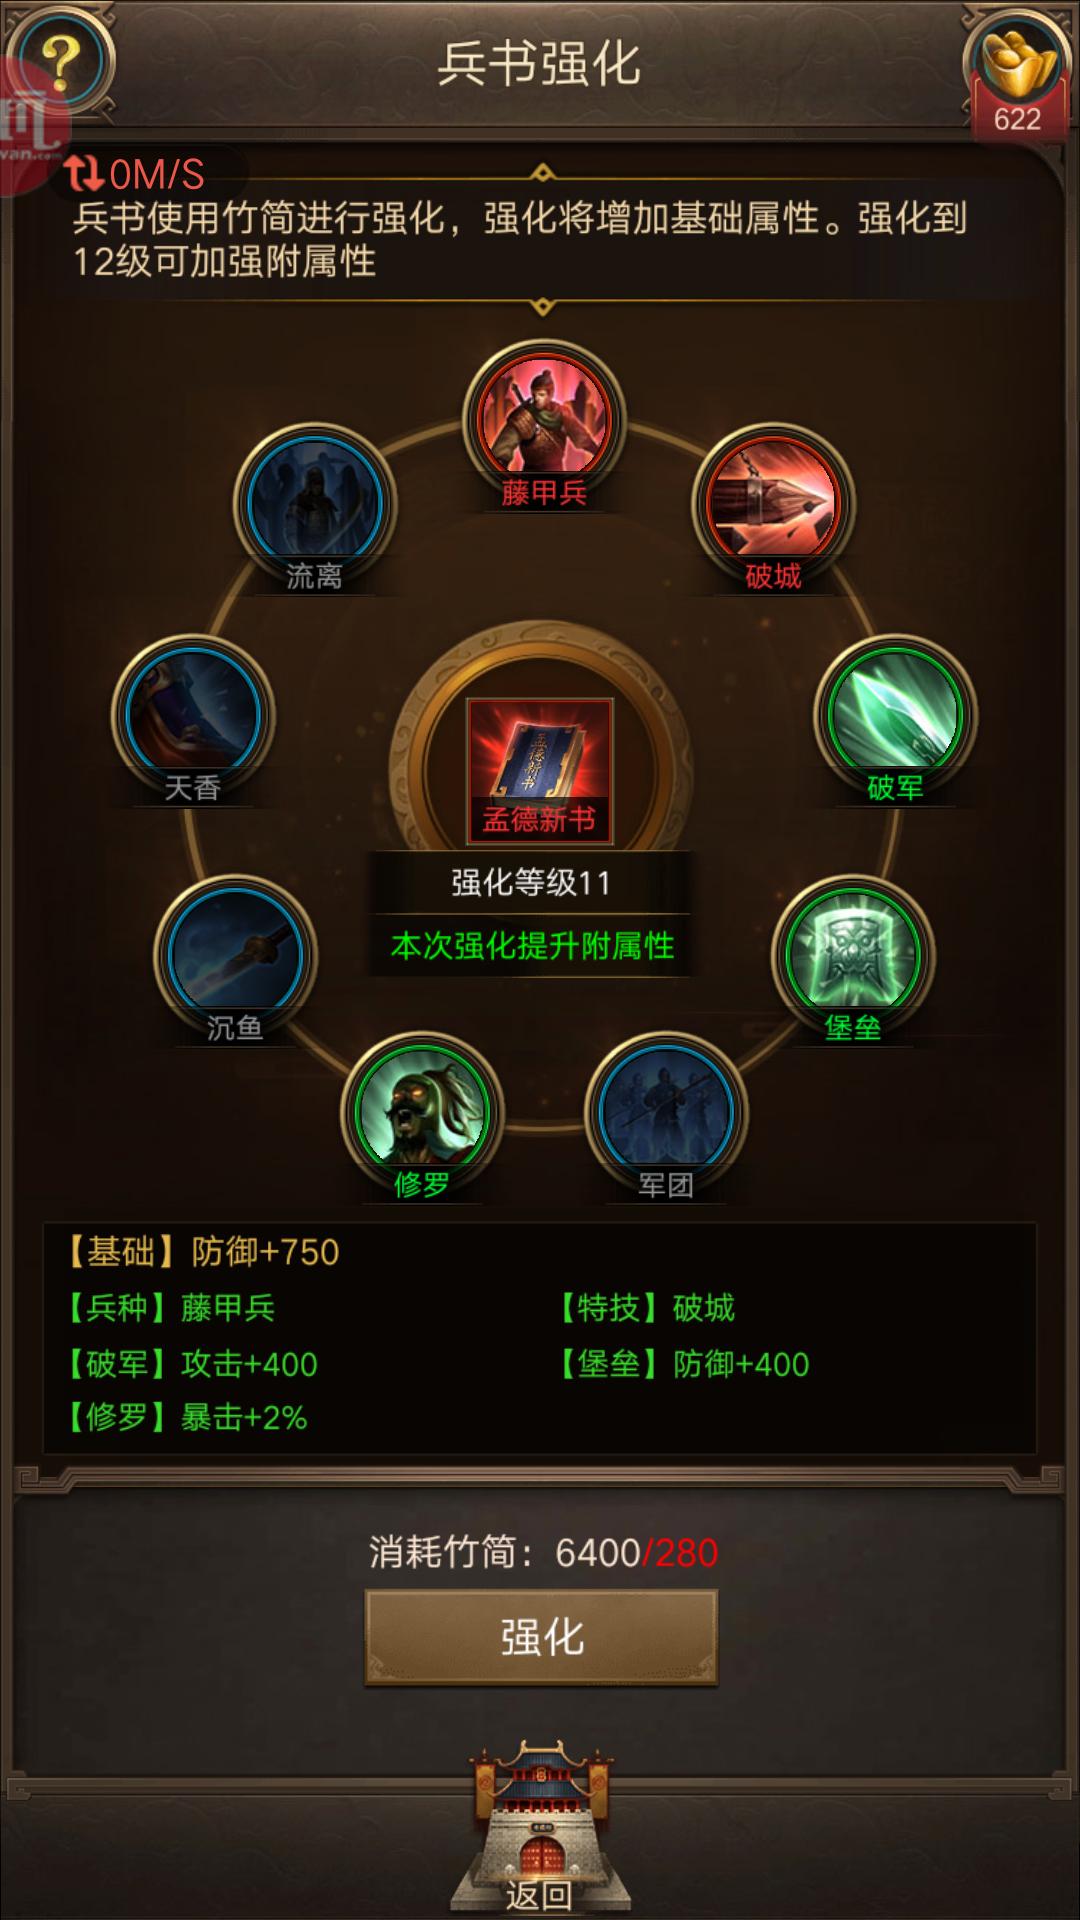 Screenshot_2018-07-26-22-52-18-10.png